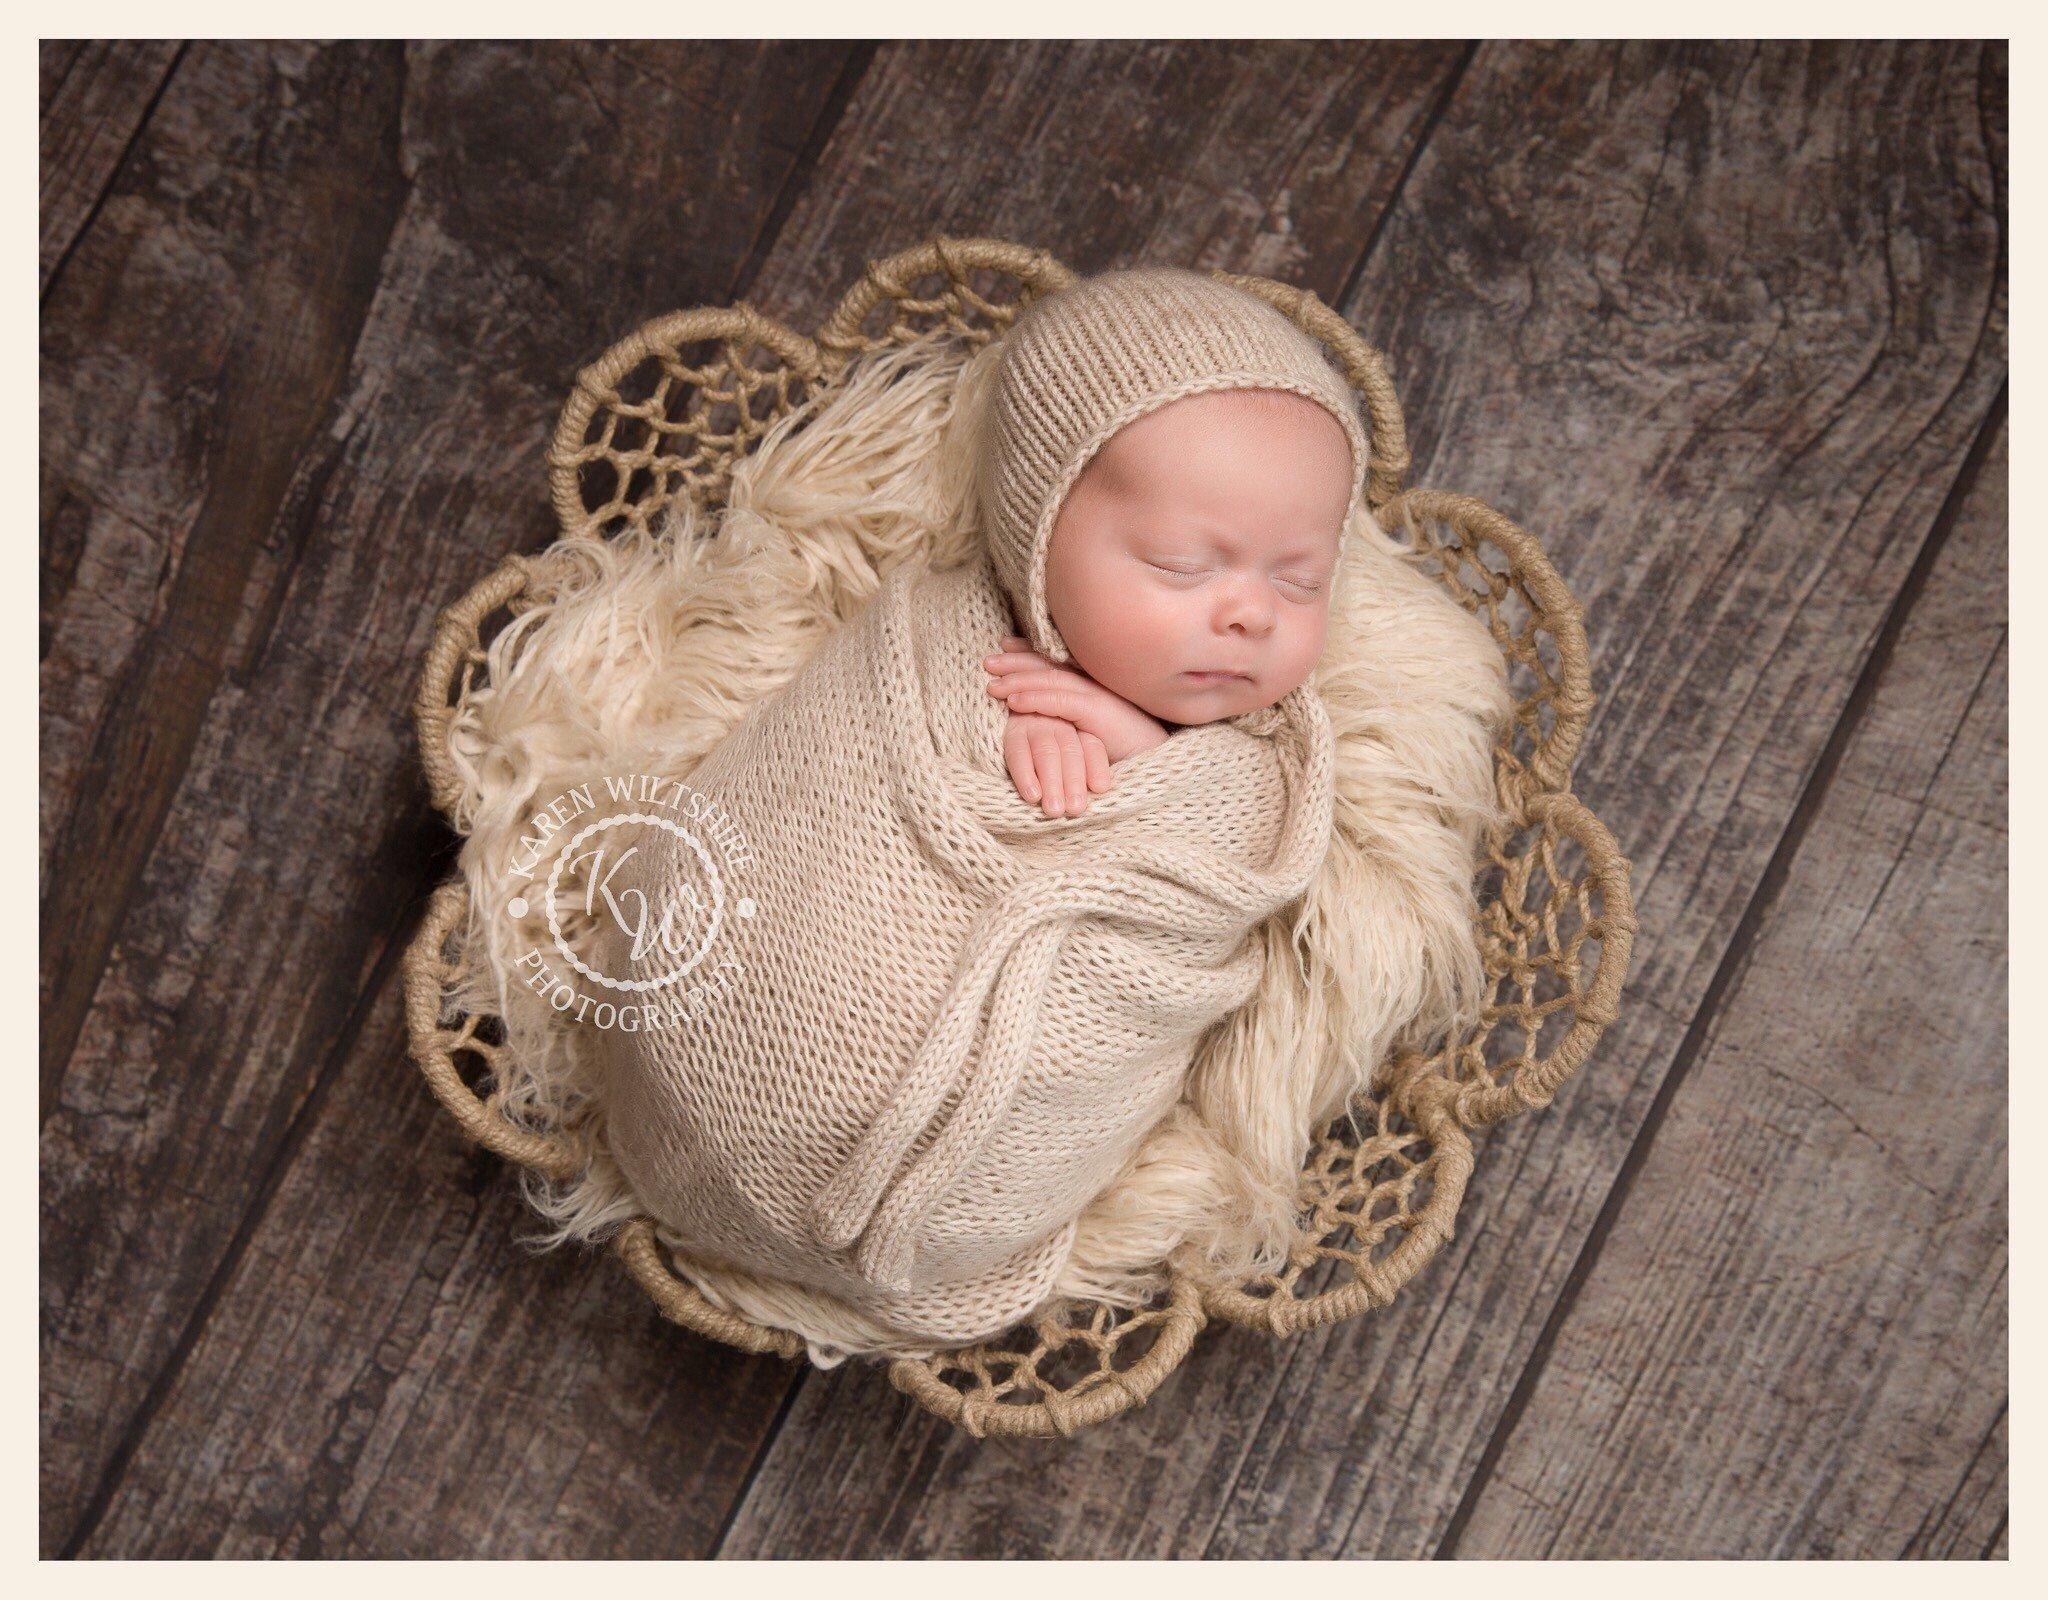 Jute Newborn Photography Basket Props Baby Flokati Photo Shoot Accessories Basket For Studio Posing Bowl prop box clutch purse